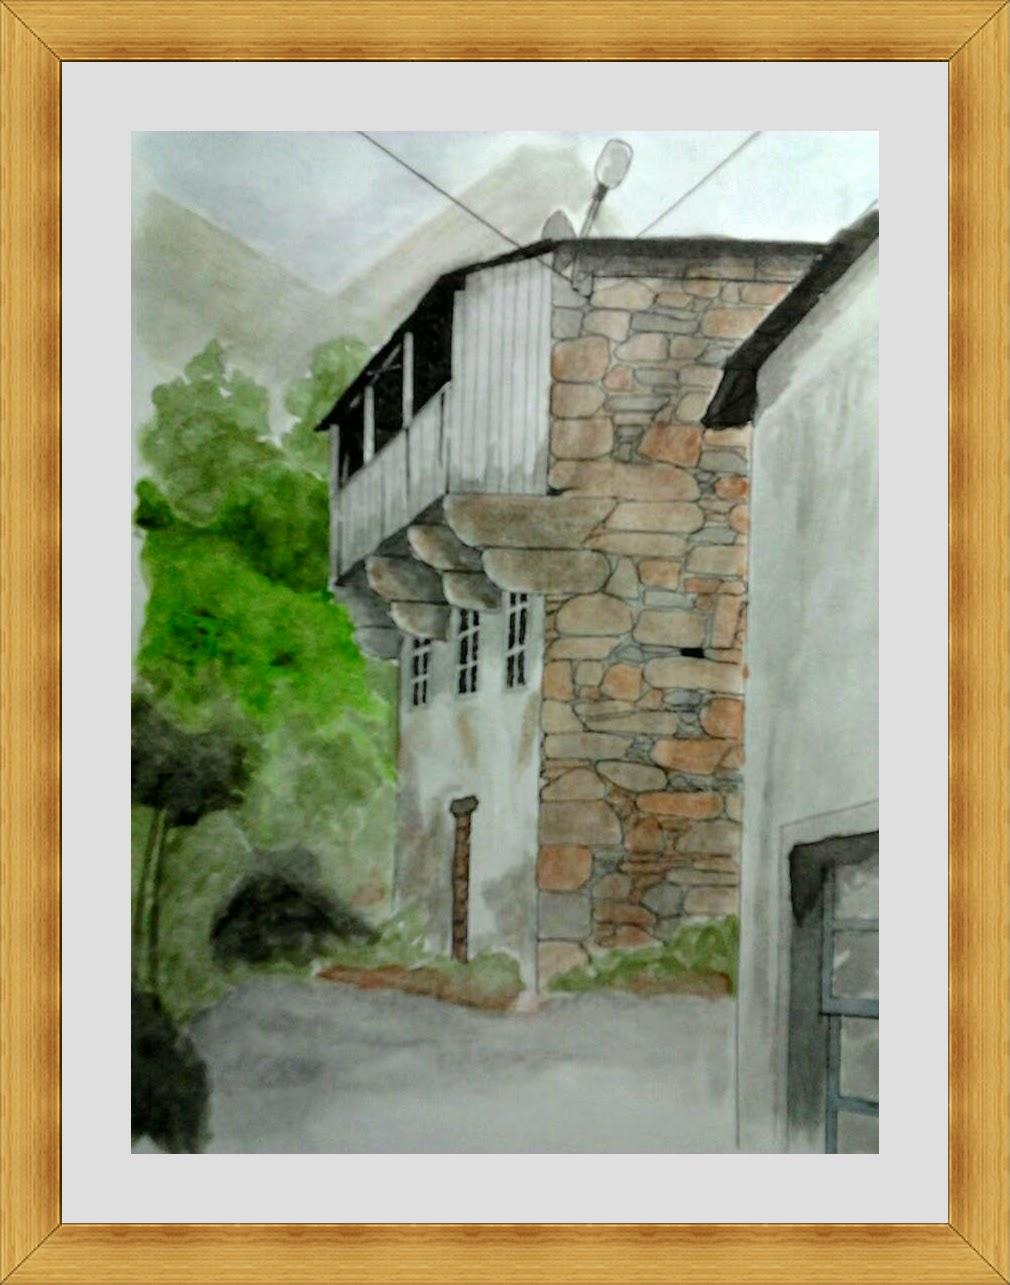 dibujo pintura plumilla acuarela tecnica mixta galeria arte casa rural mondoñedo